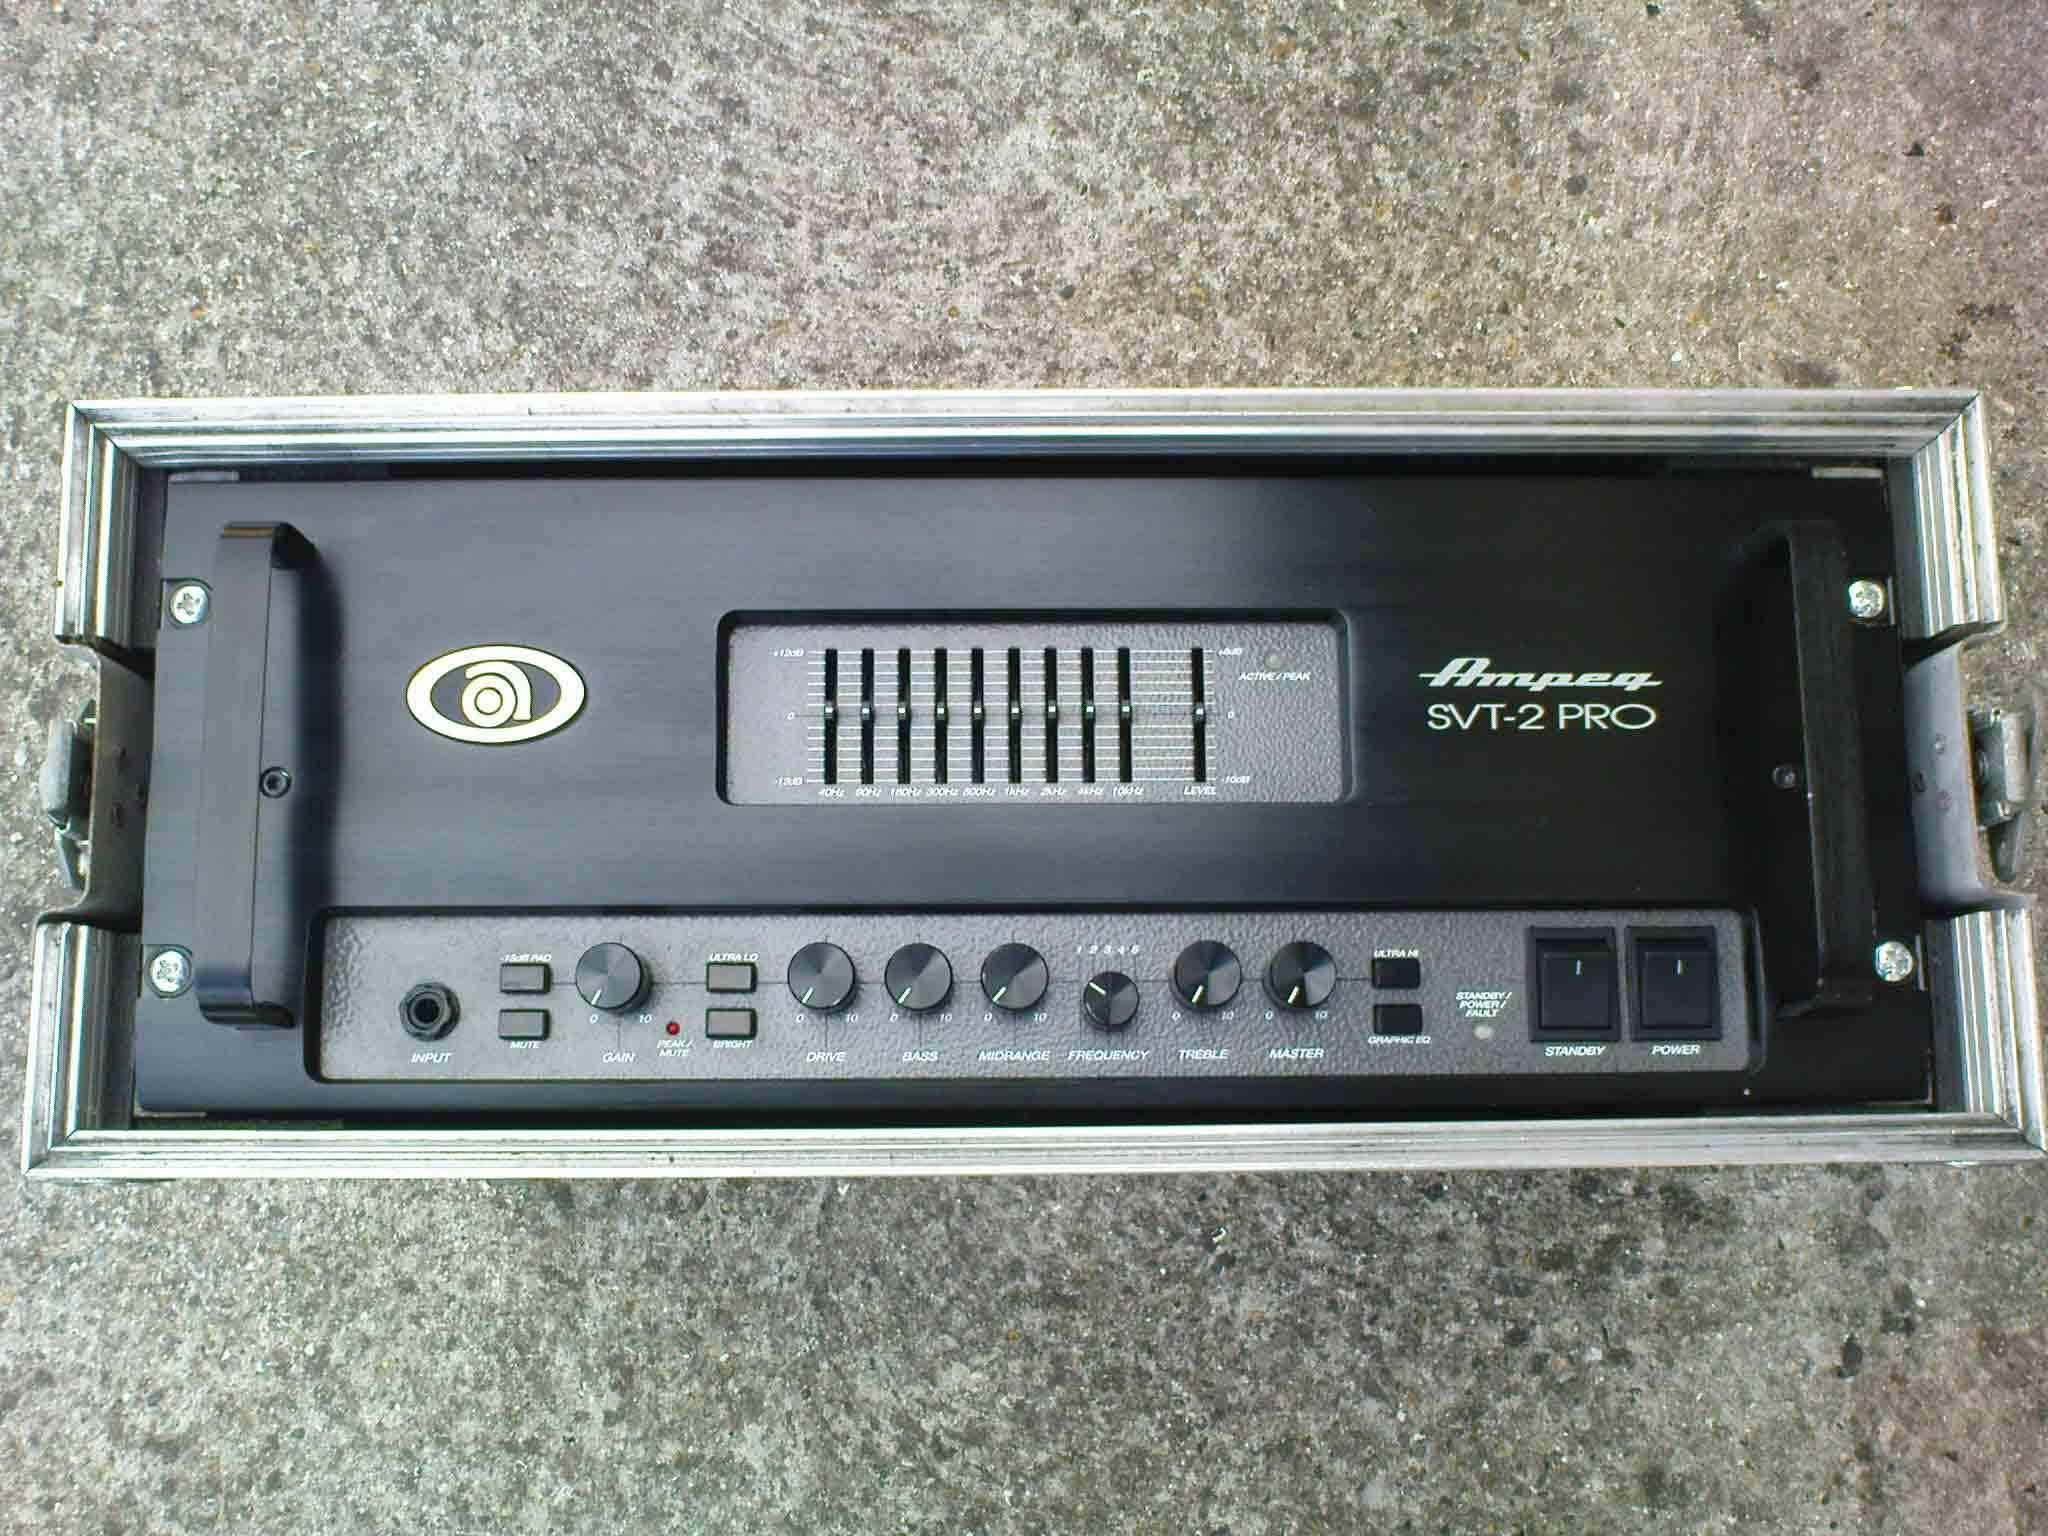 ampeg svt 2 pro image 90664 audiofanzine rh en audiofanzine com ampeg svt 2 pro manual pdf ampeg svt 2 pro schematic